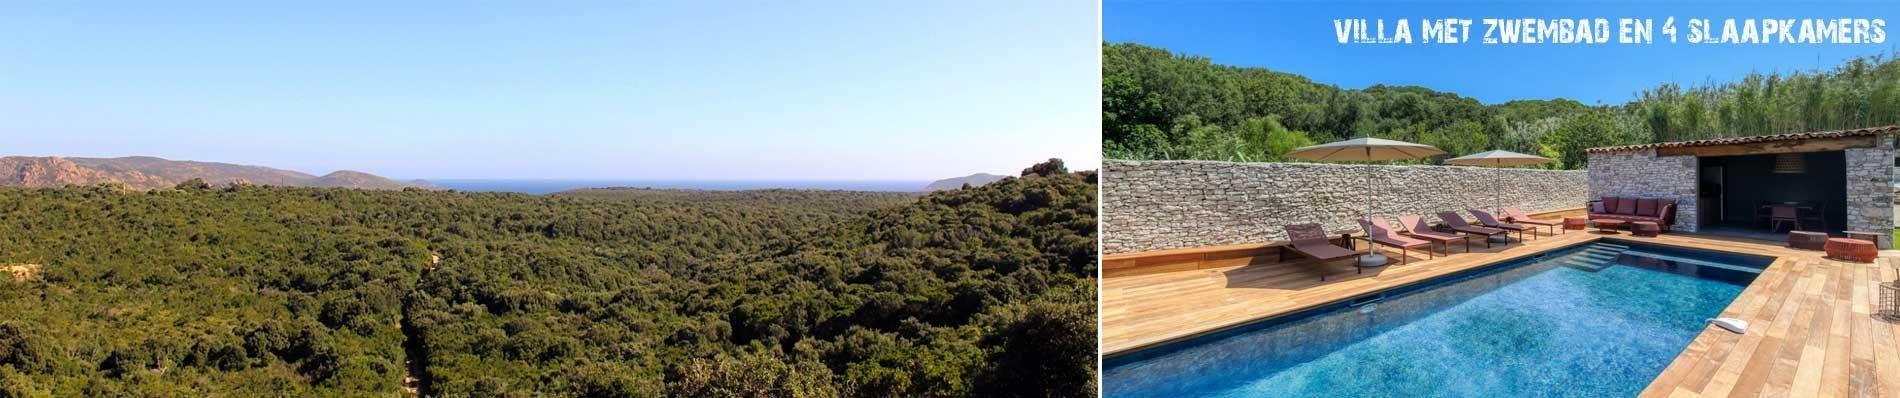 VILLA-ZWEMBAD VERSION MAQUIS corsica luxe villa zomervakantie